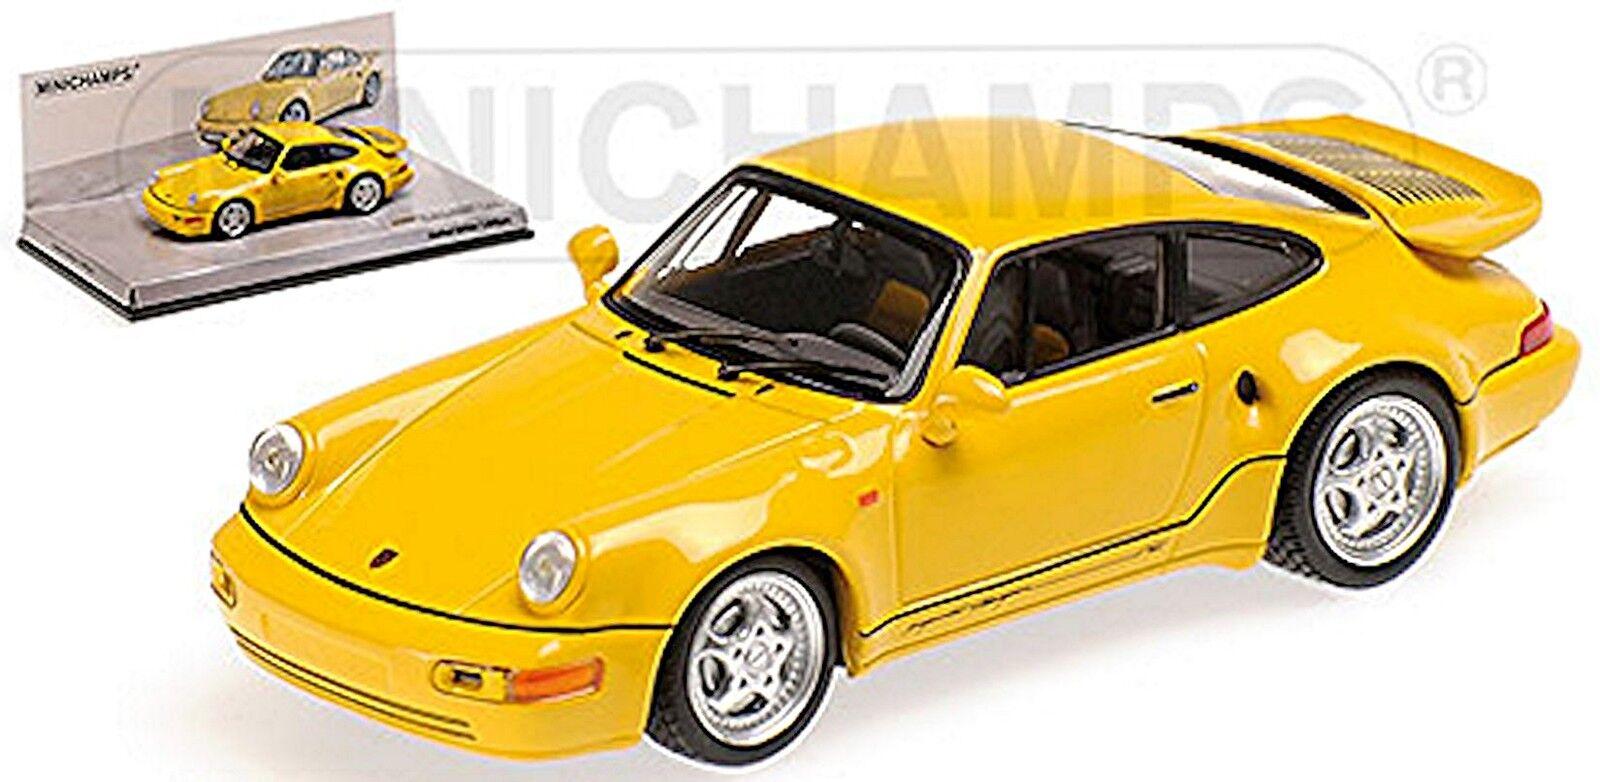 Porsche 911 turbo s 3,3 964 Lightweight 1992 speedjaune jaune jaune jaune 1 43 MINICHAMPS 4ce101